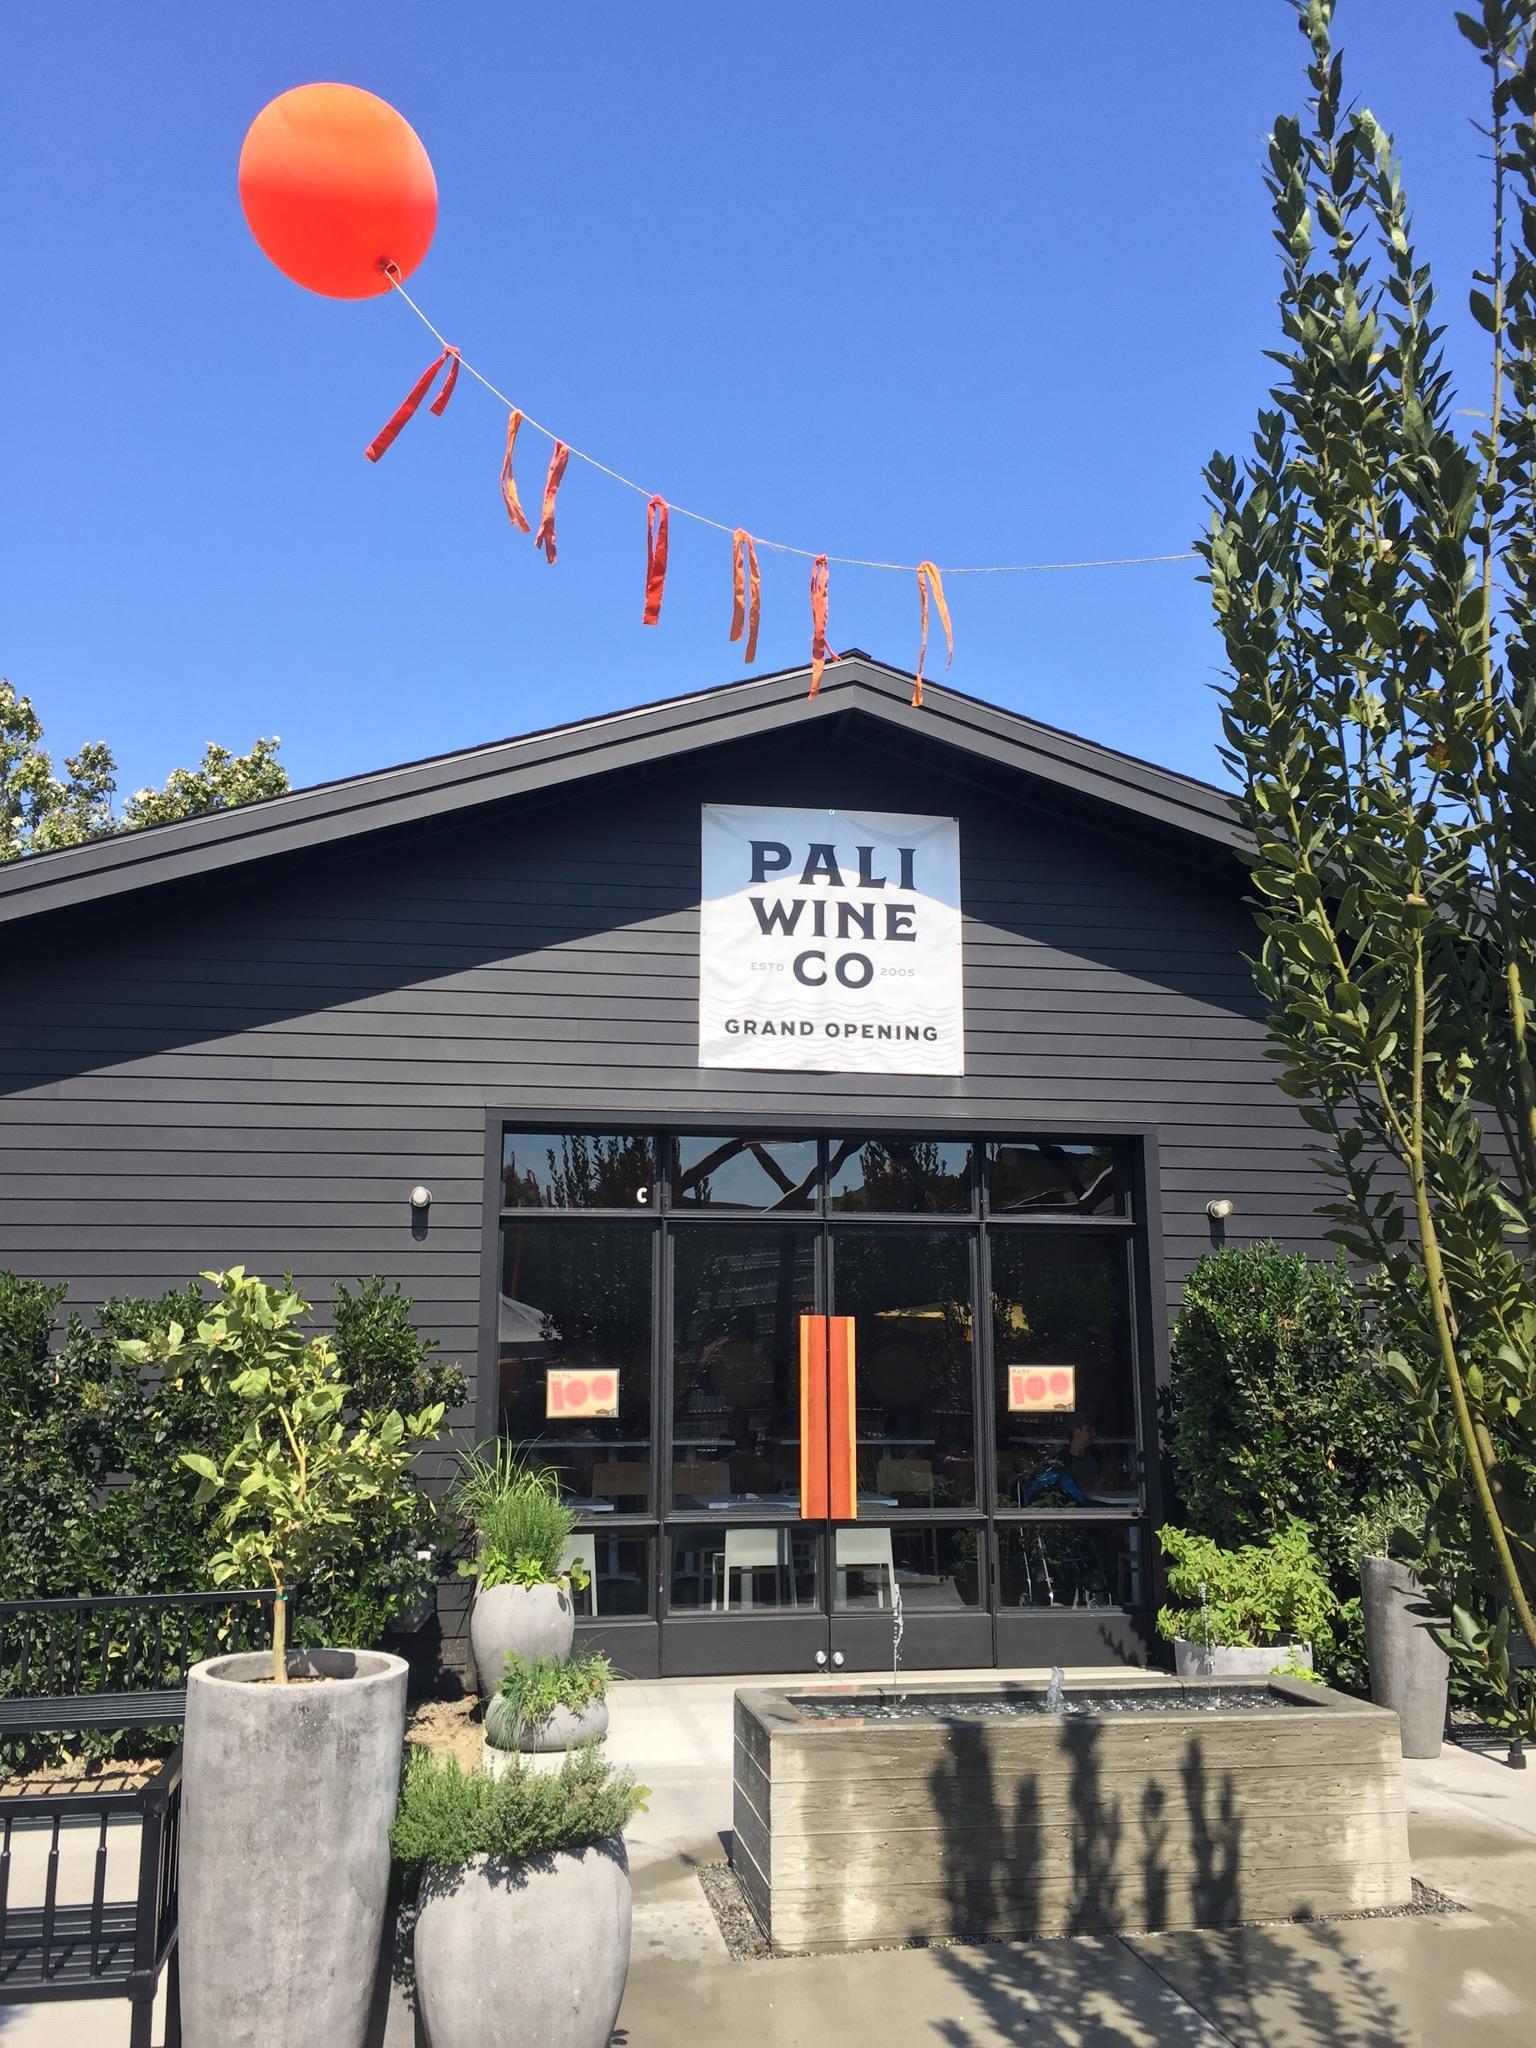 Pali Wine Co. image 2